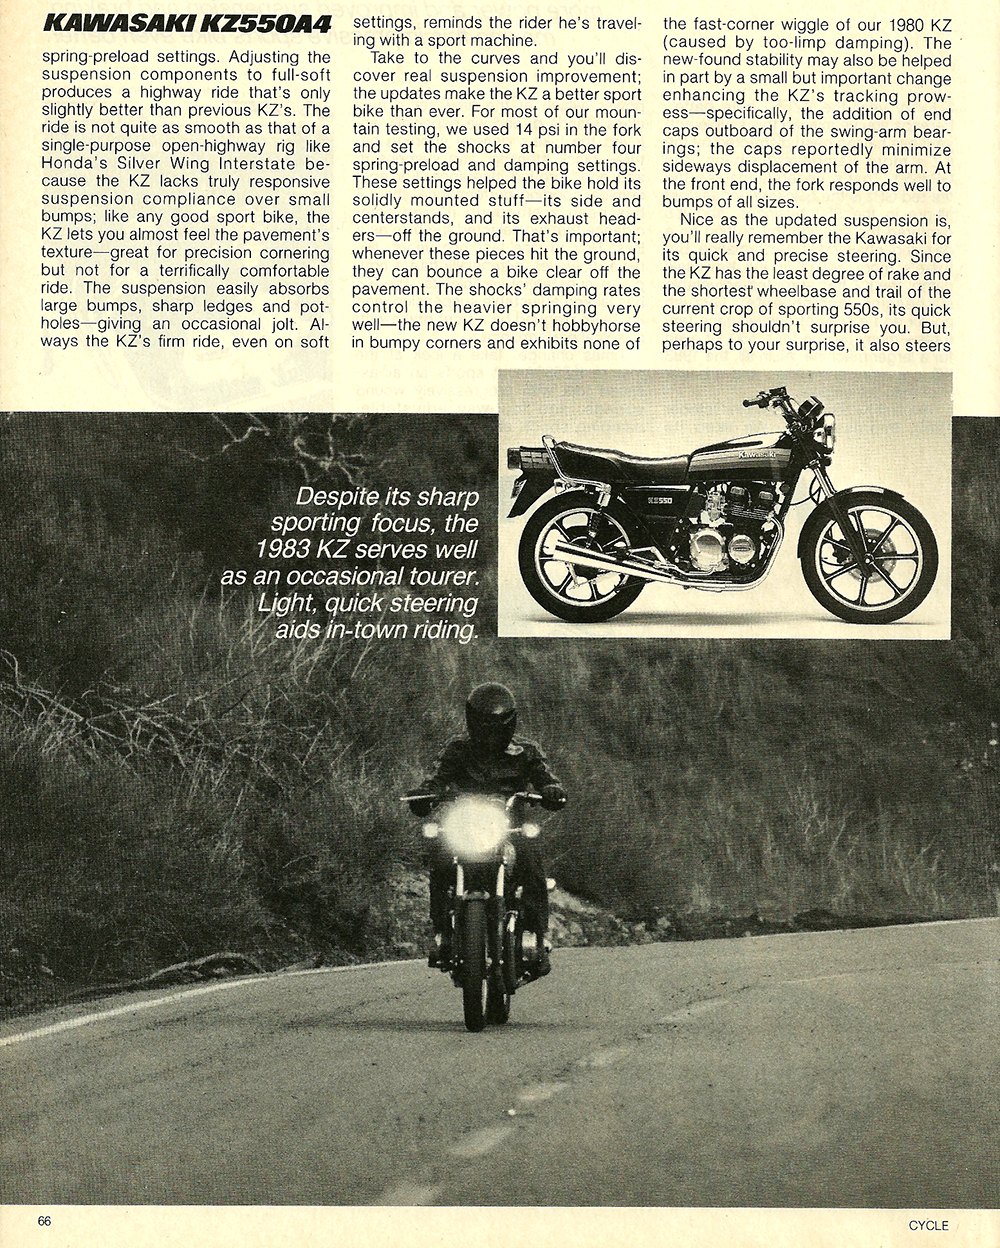 1983 Kawasaki KZ550 A4 road test 2.jpg